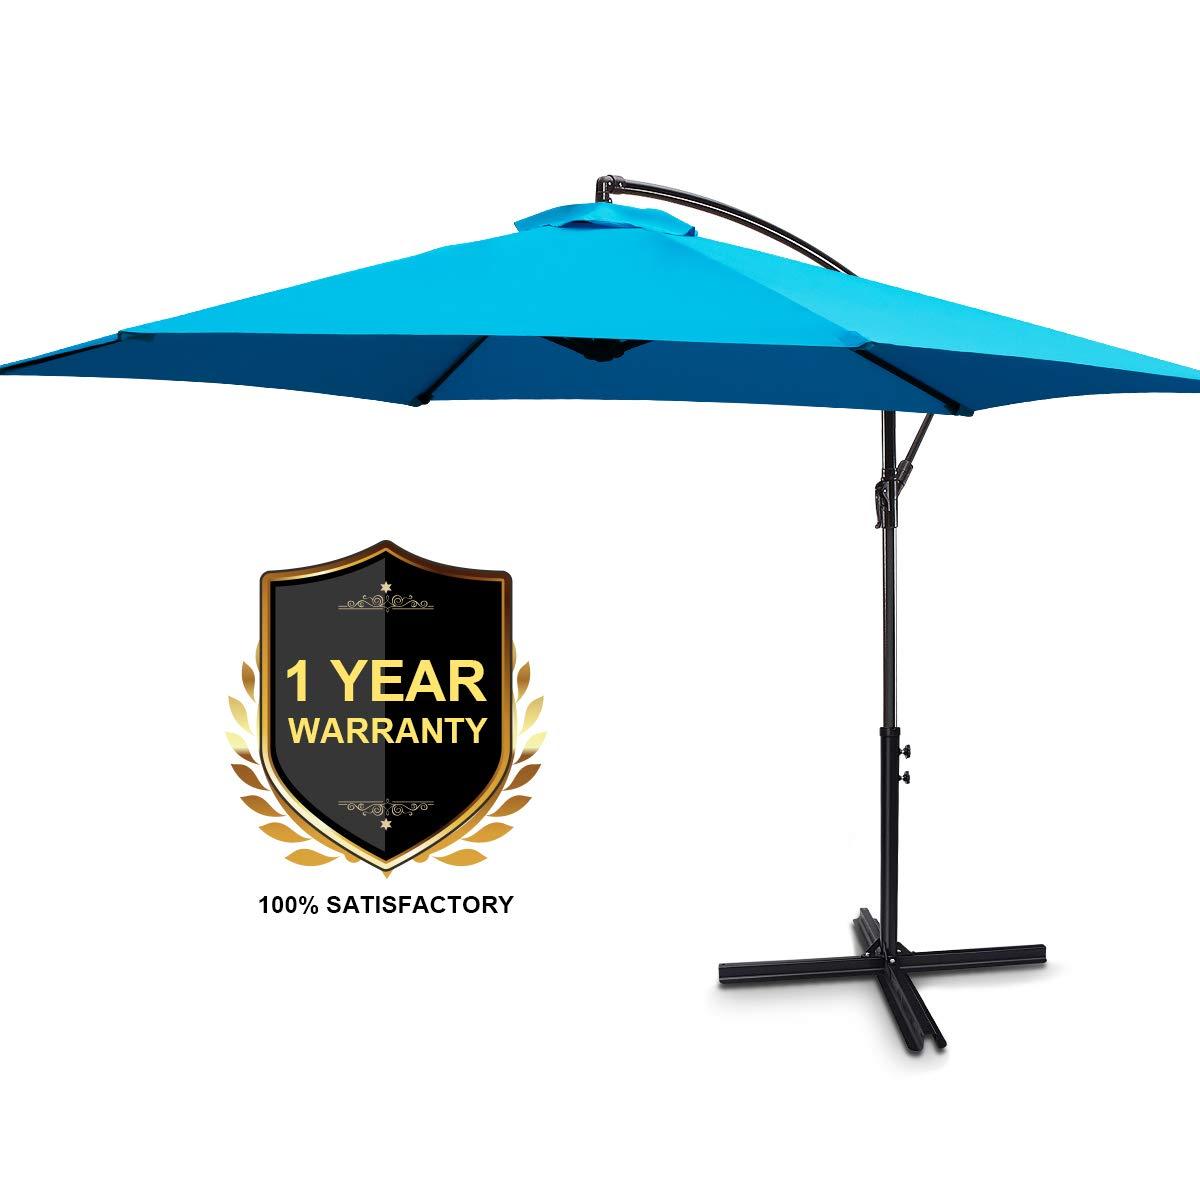 FRUITEAM Offset Hanging Umbrellas 10 Feet Outdoor Patio Garden Umbrellas Market Umbrella with Auto Tilt & Cross Base, Cantilever Offset Umbrella Waterproof UV Protection, Sky Blue